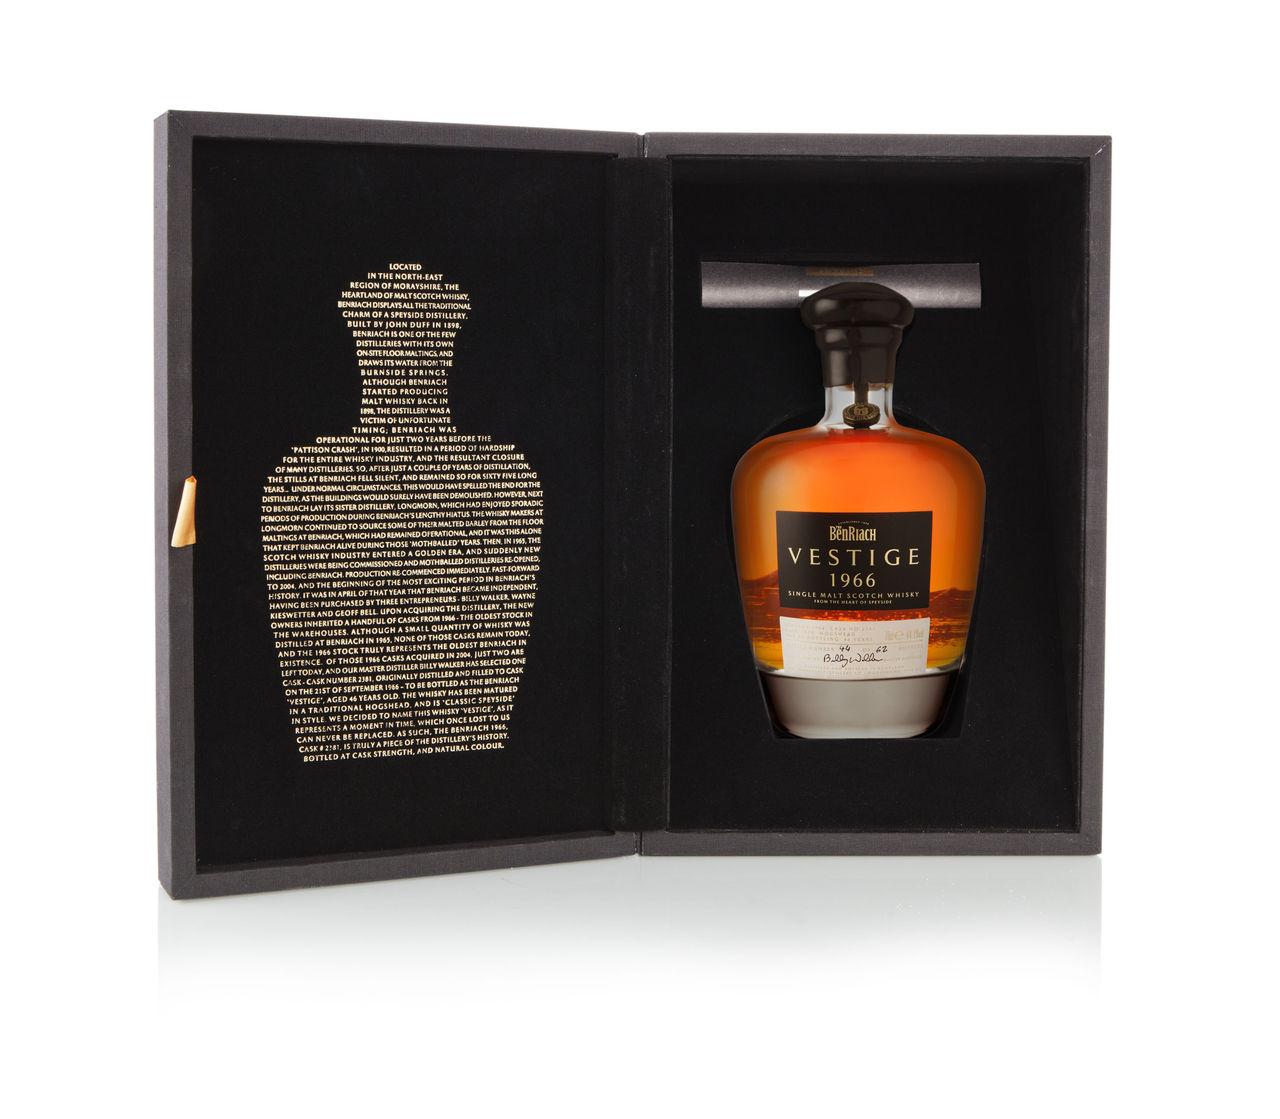 Benriach släpper whisky från 1966